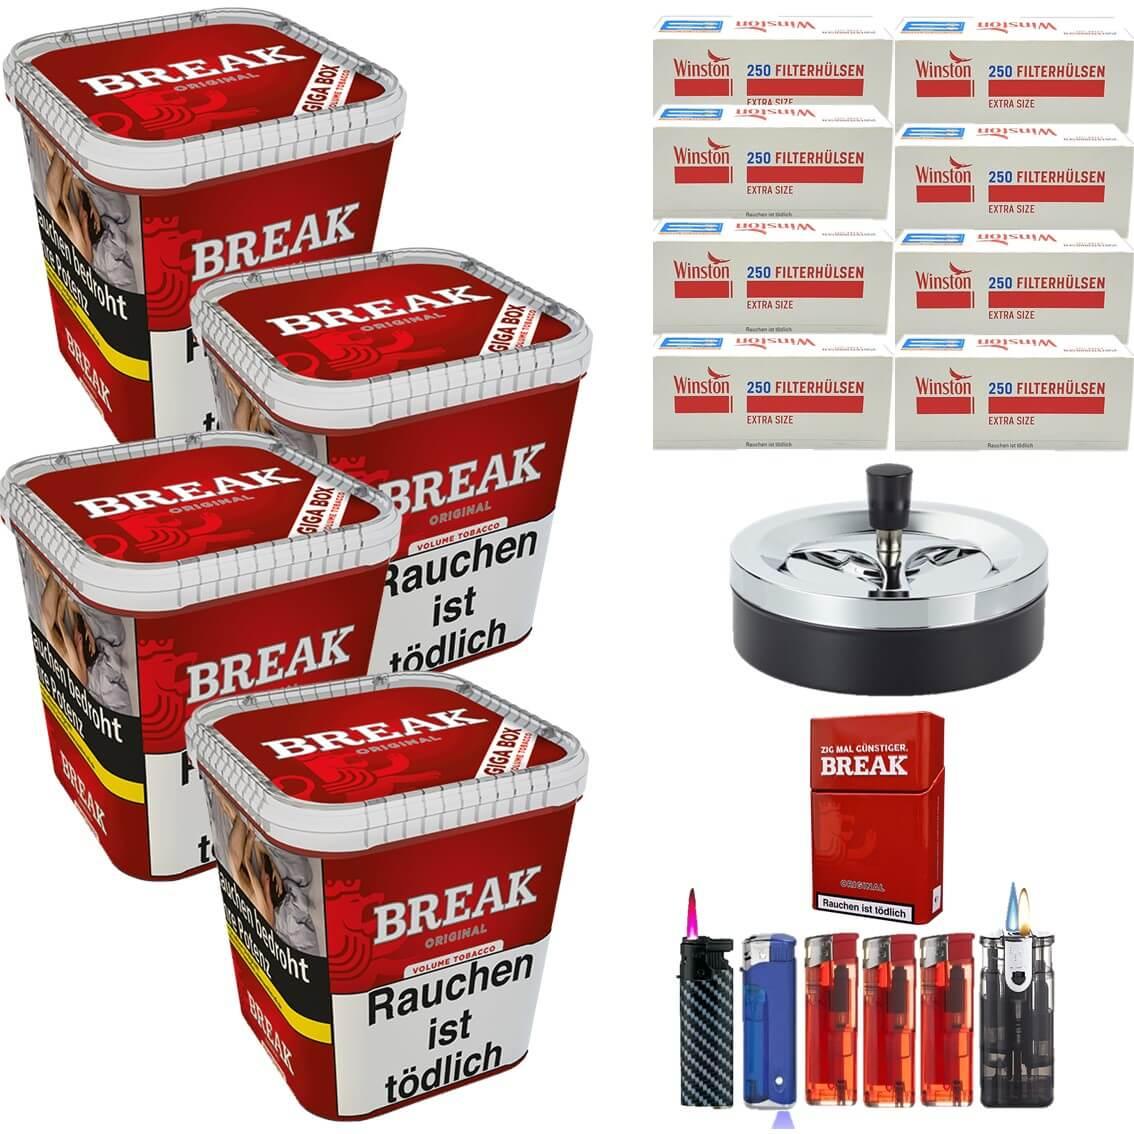 Break Original 4 x 240g Volumentabak 2000 Extra Size Filterhülsen Uvm.